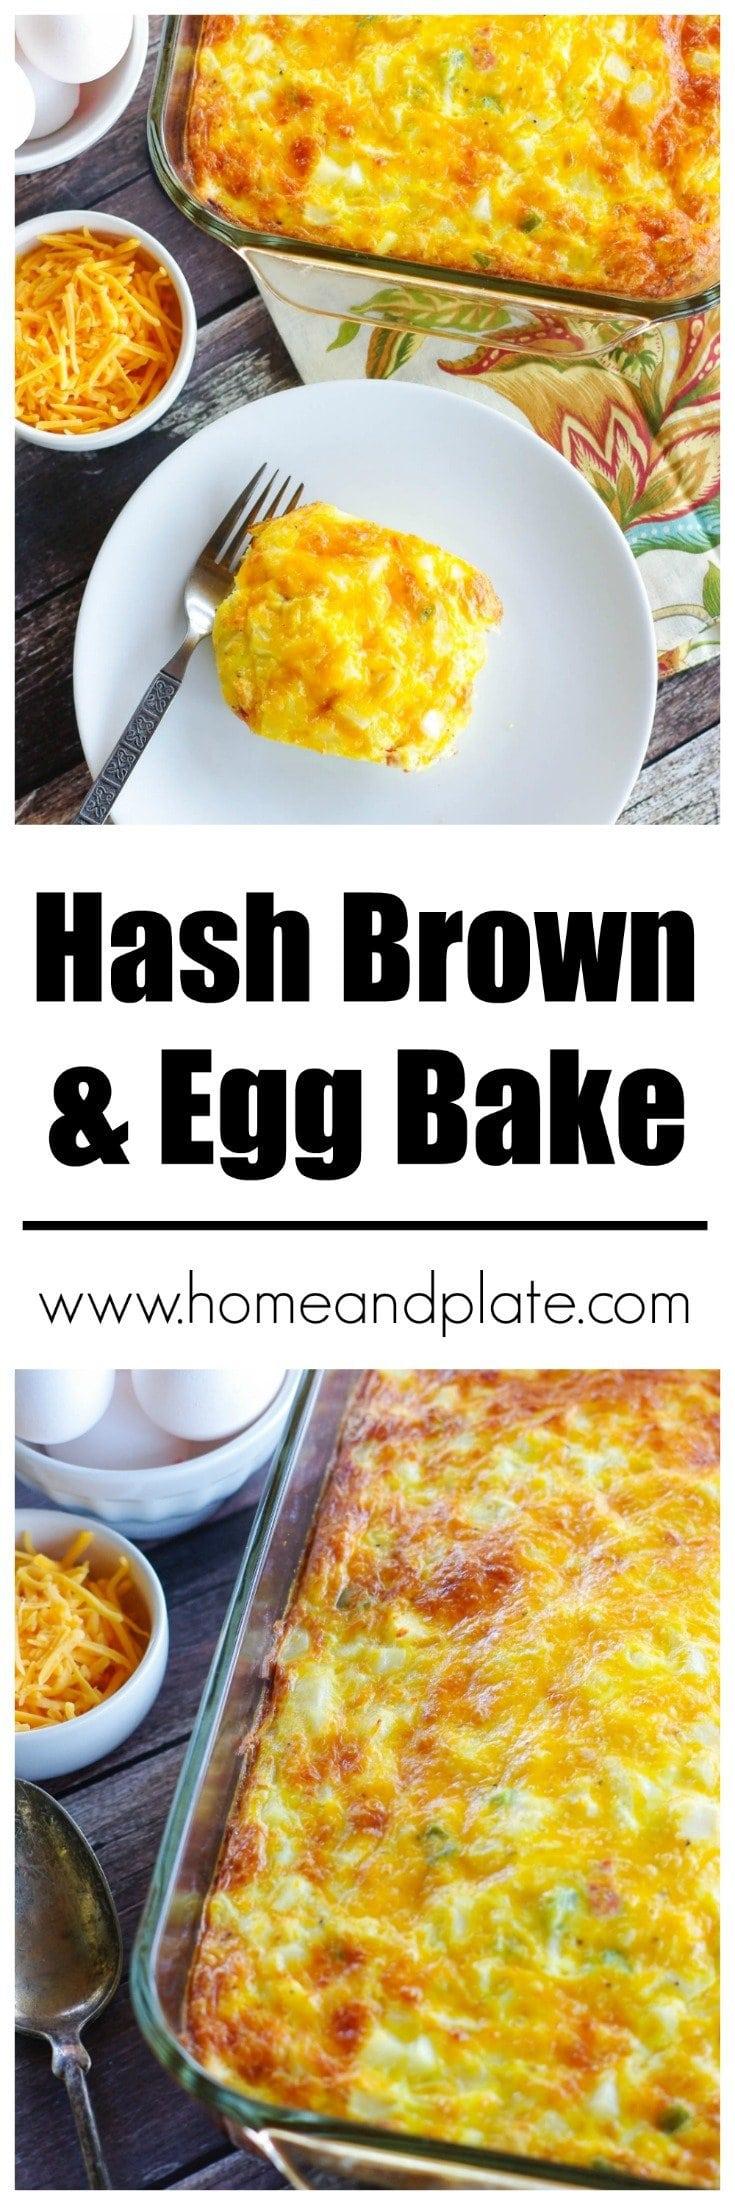 Hash Brown Egg Bake | www.homeandplate.com | It